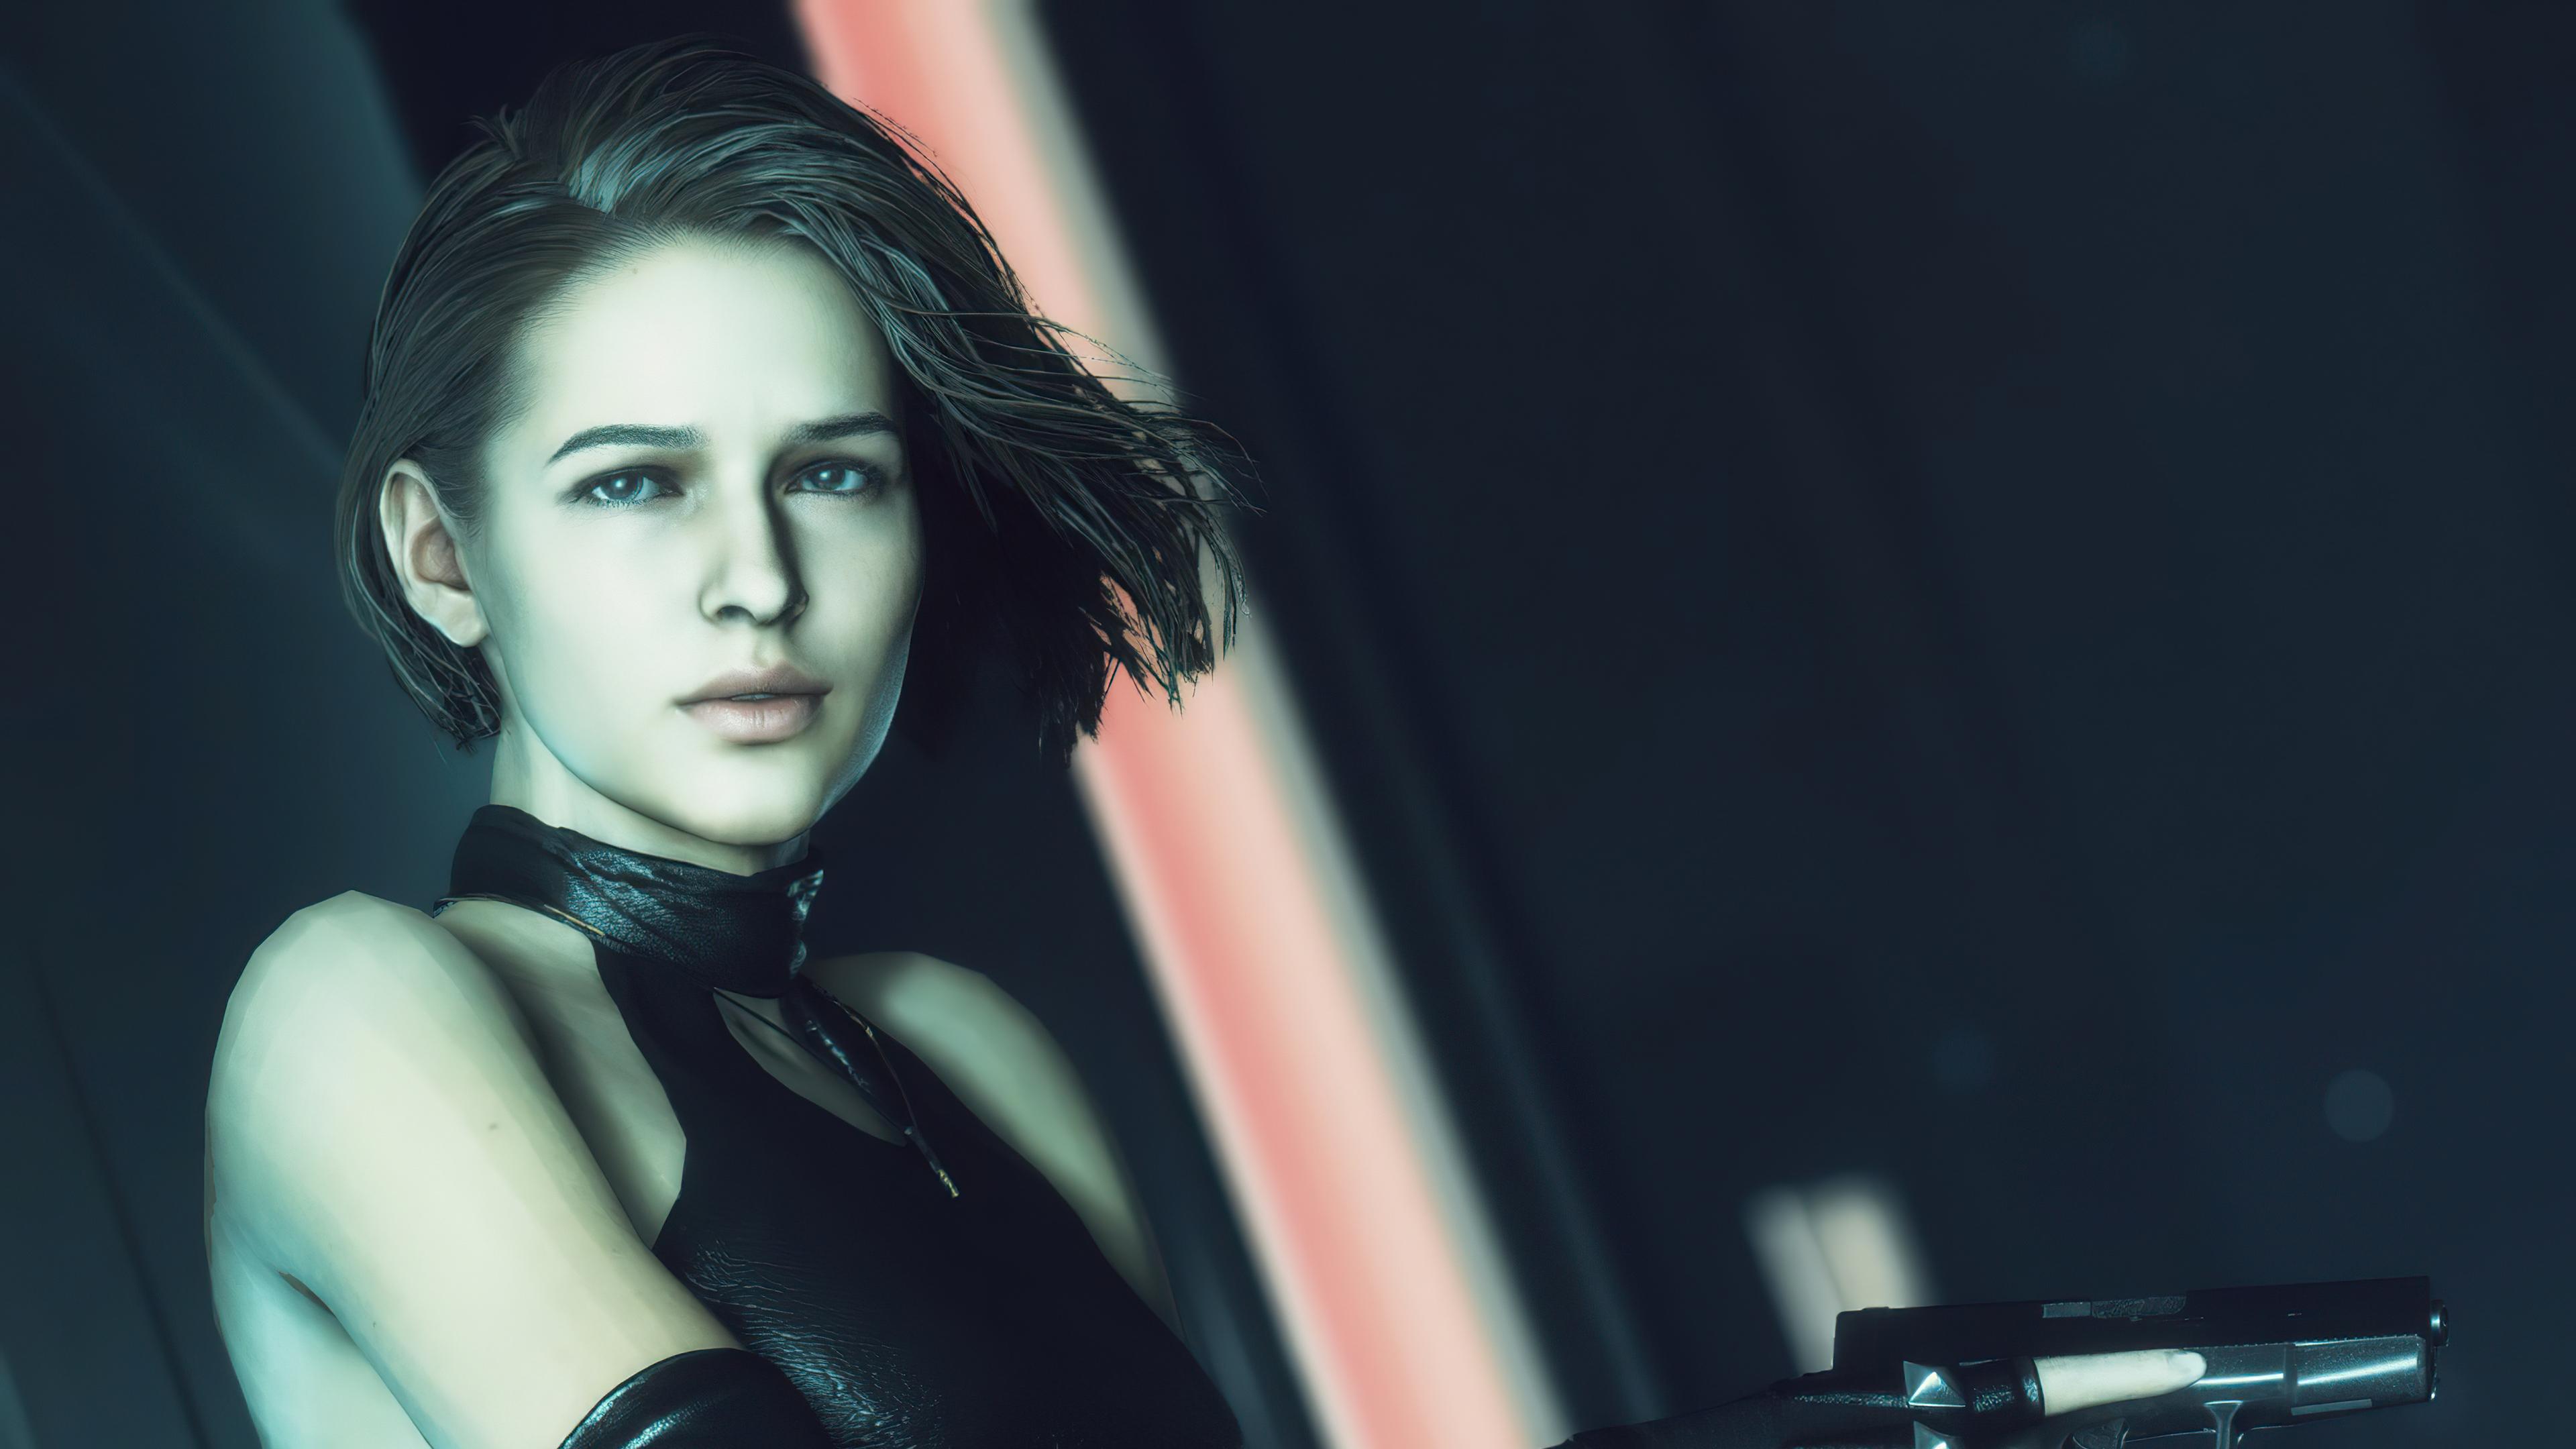 jill resident evil with gun 4k 1615132373 - Jill Resident Evil With Gun 4k - Jill Resident Evil With Gun 4k wallpapers